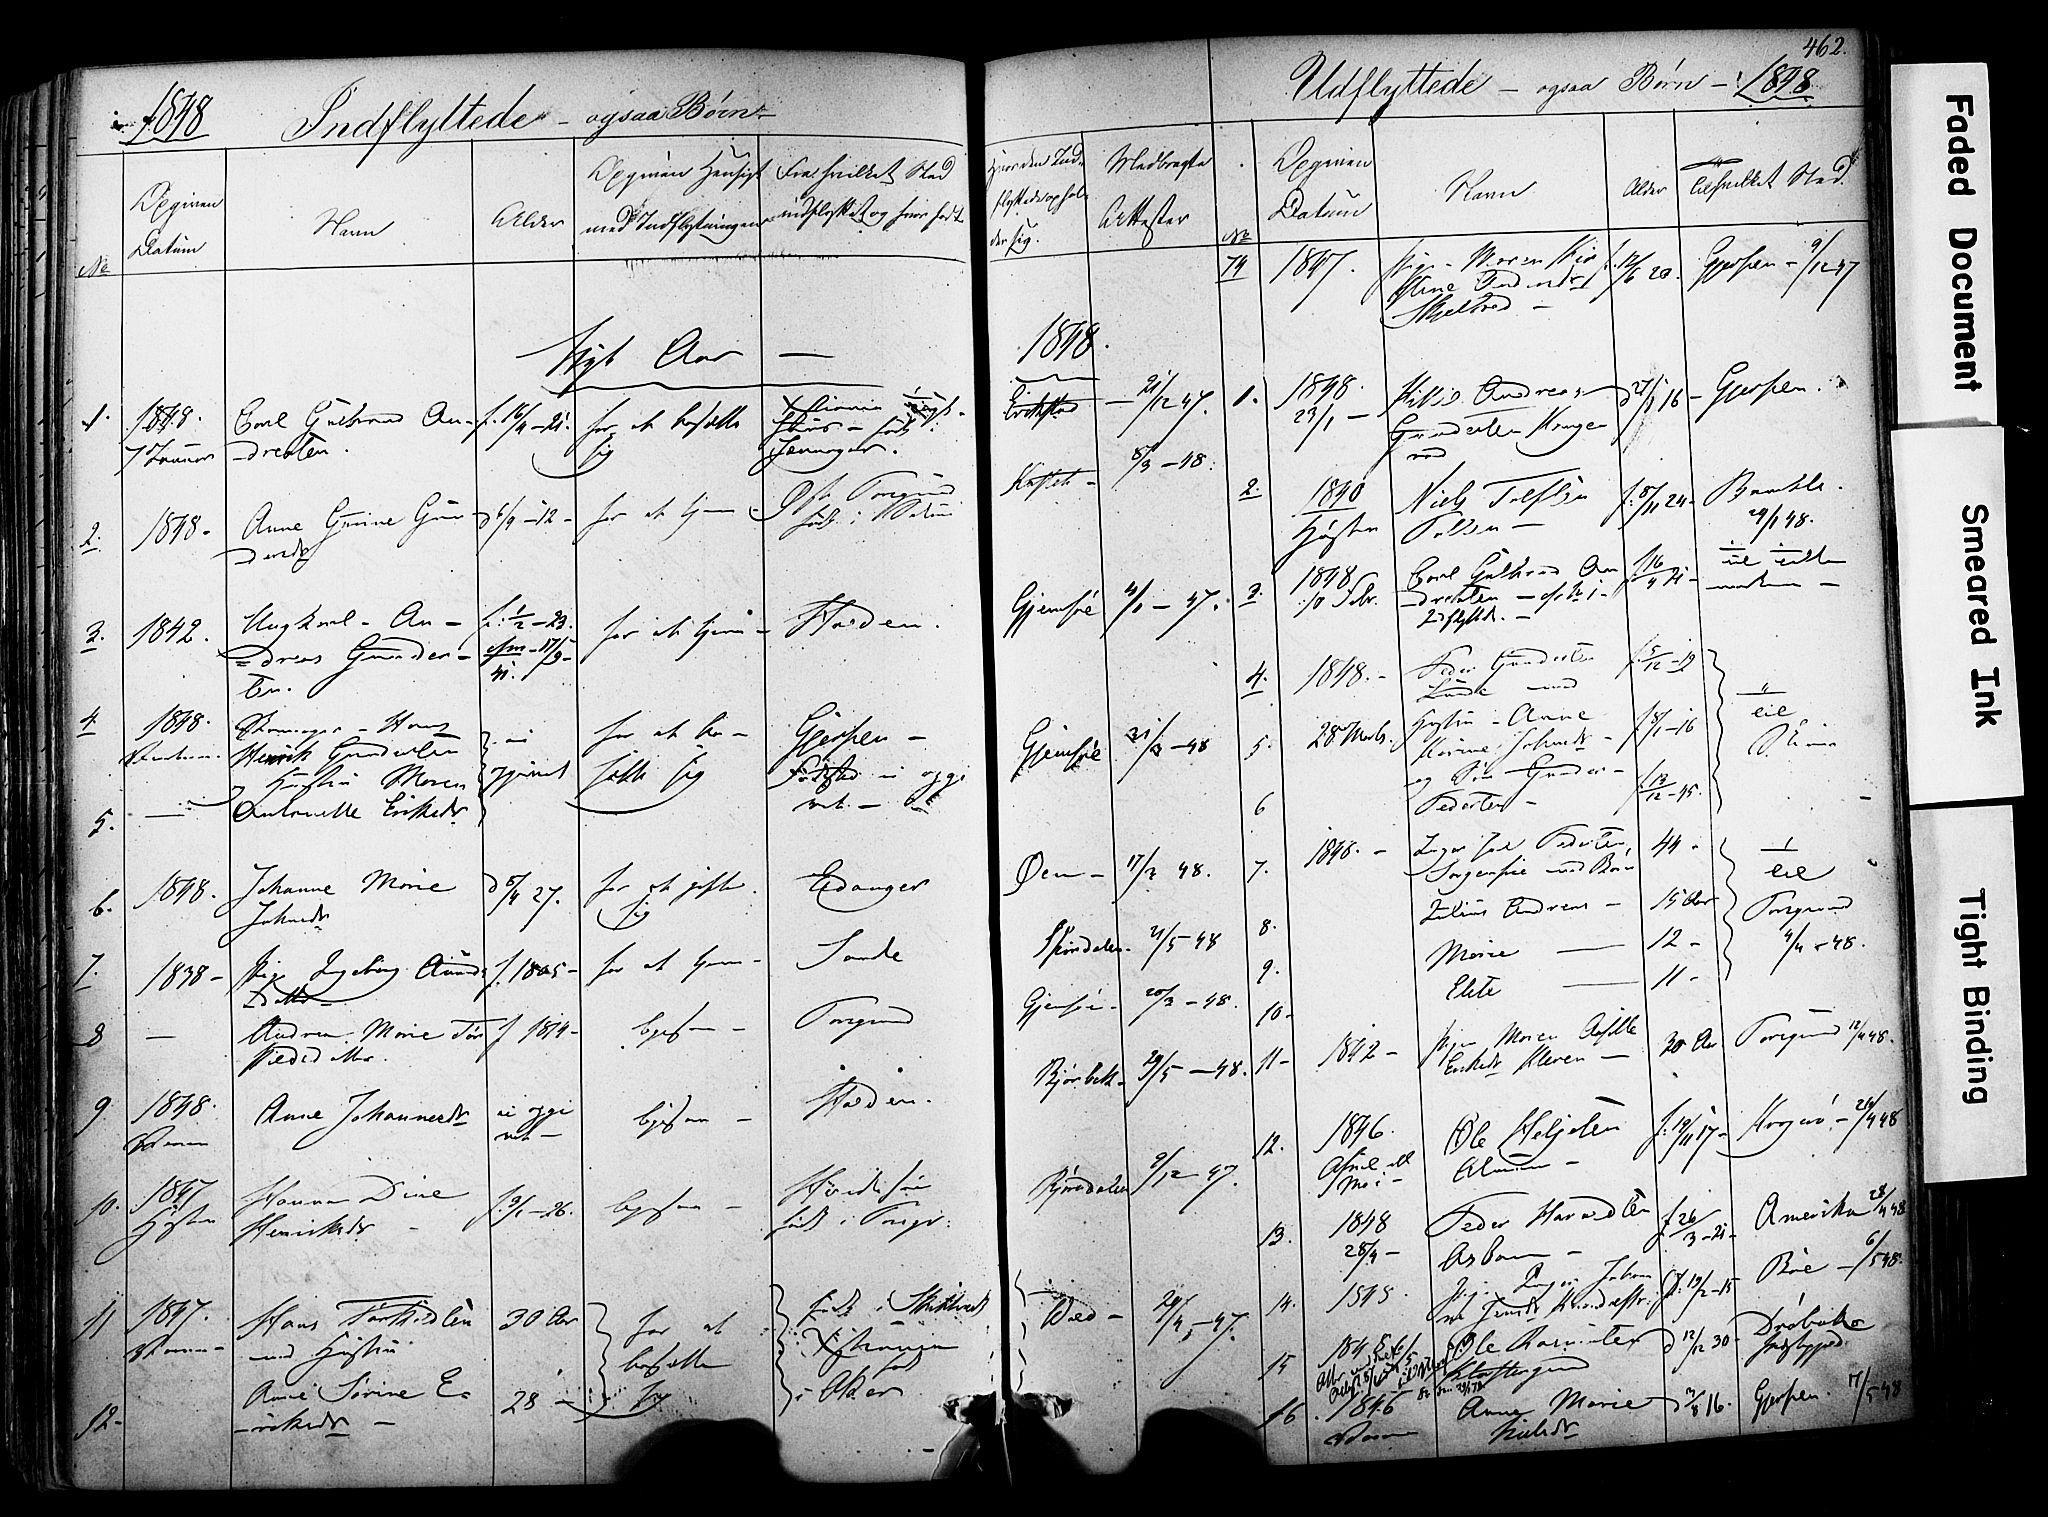 SAKO, Solum kirkebøker, F/Fa/L0006: Ministerialbok nr. I 6, 1844-1855, s. 462